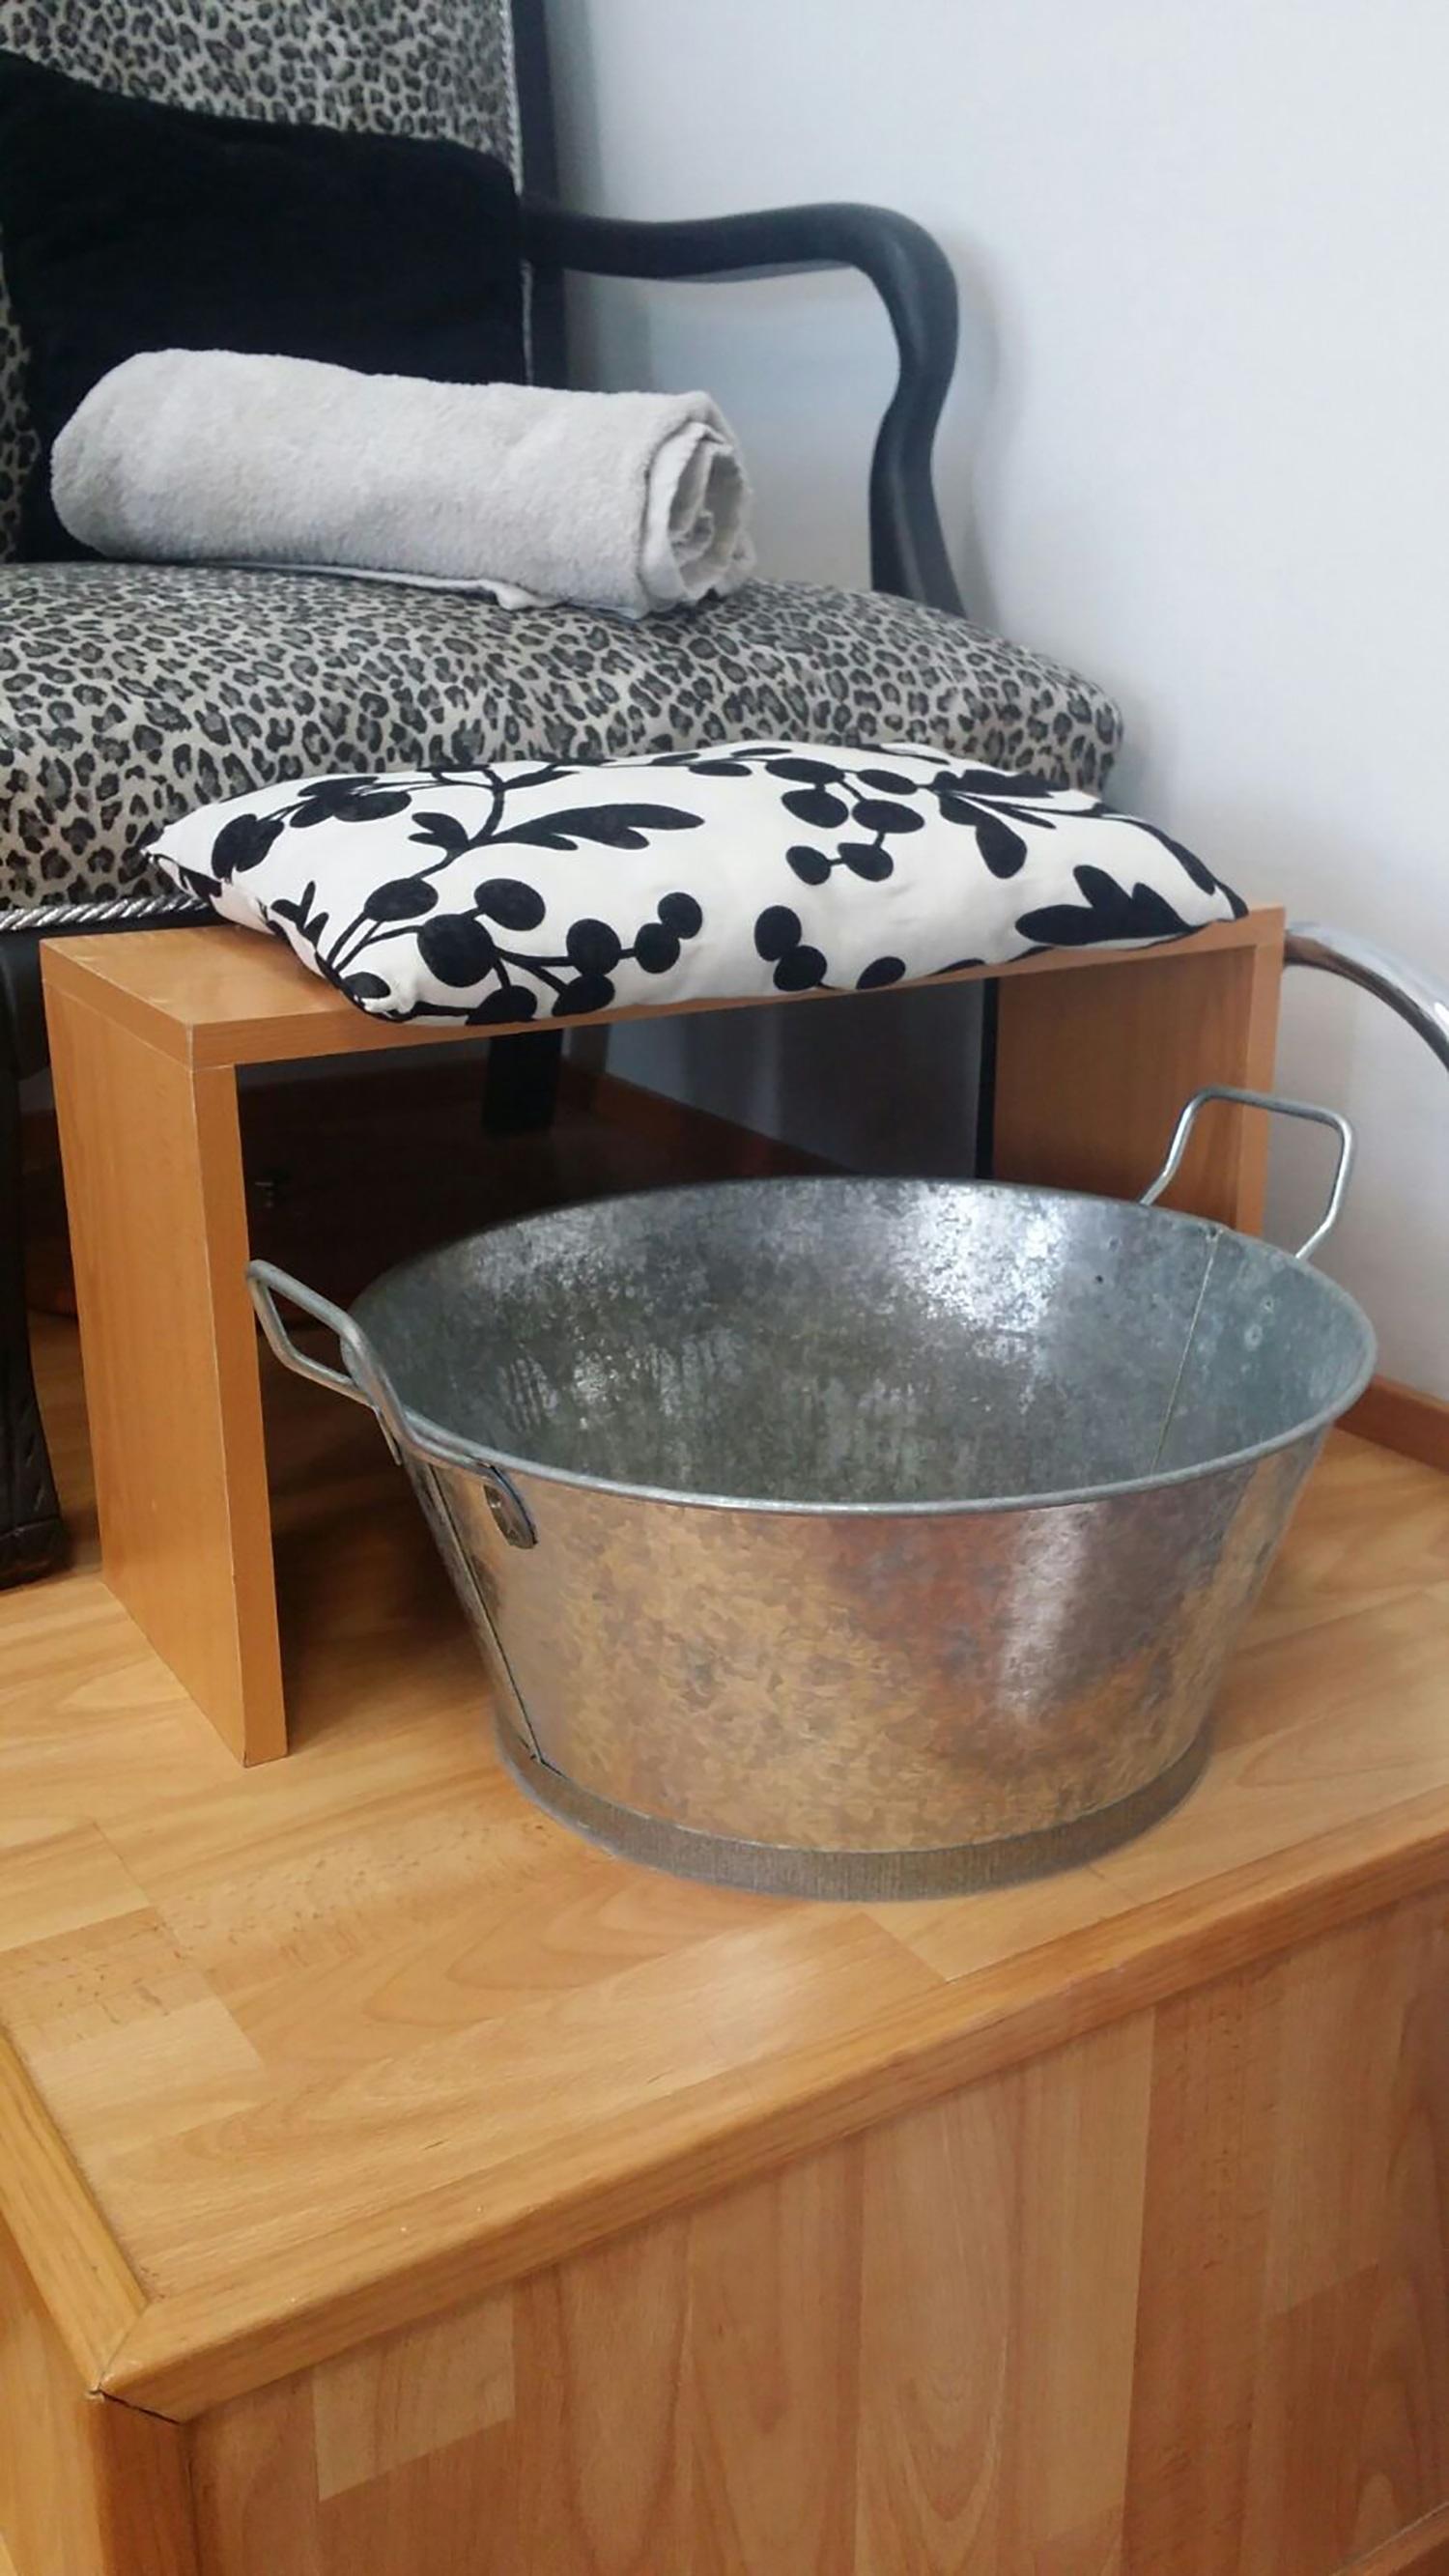 madera piso cermico lavabo mueble habitacin material encimera baera producto masaje piso vasija barbera arreglo de